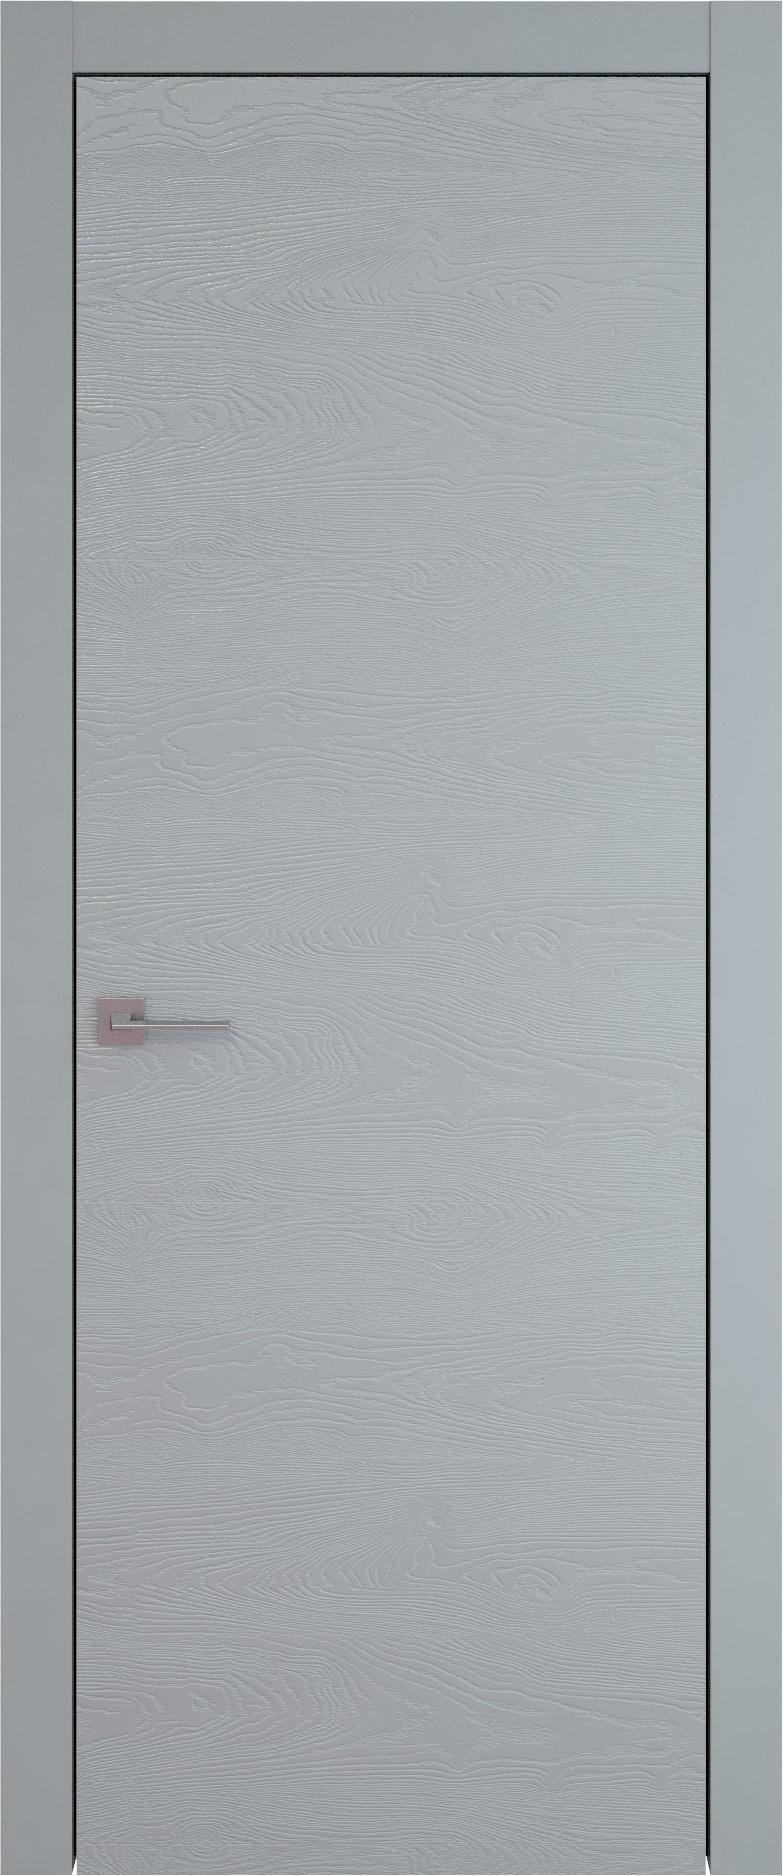 Tivoli А-5 цвет - Серебристо-серая эмаль по шпону (RAL 7045) Без стекла (ДГ)